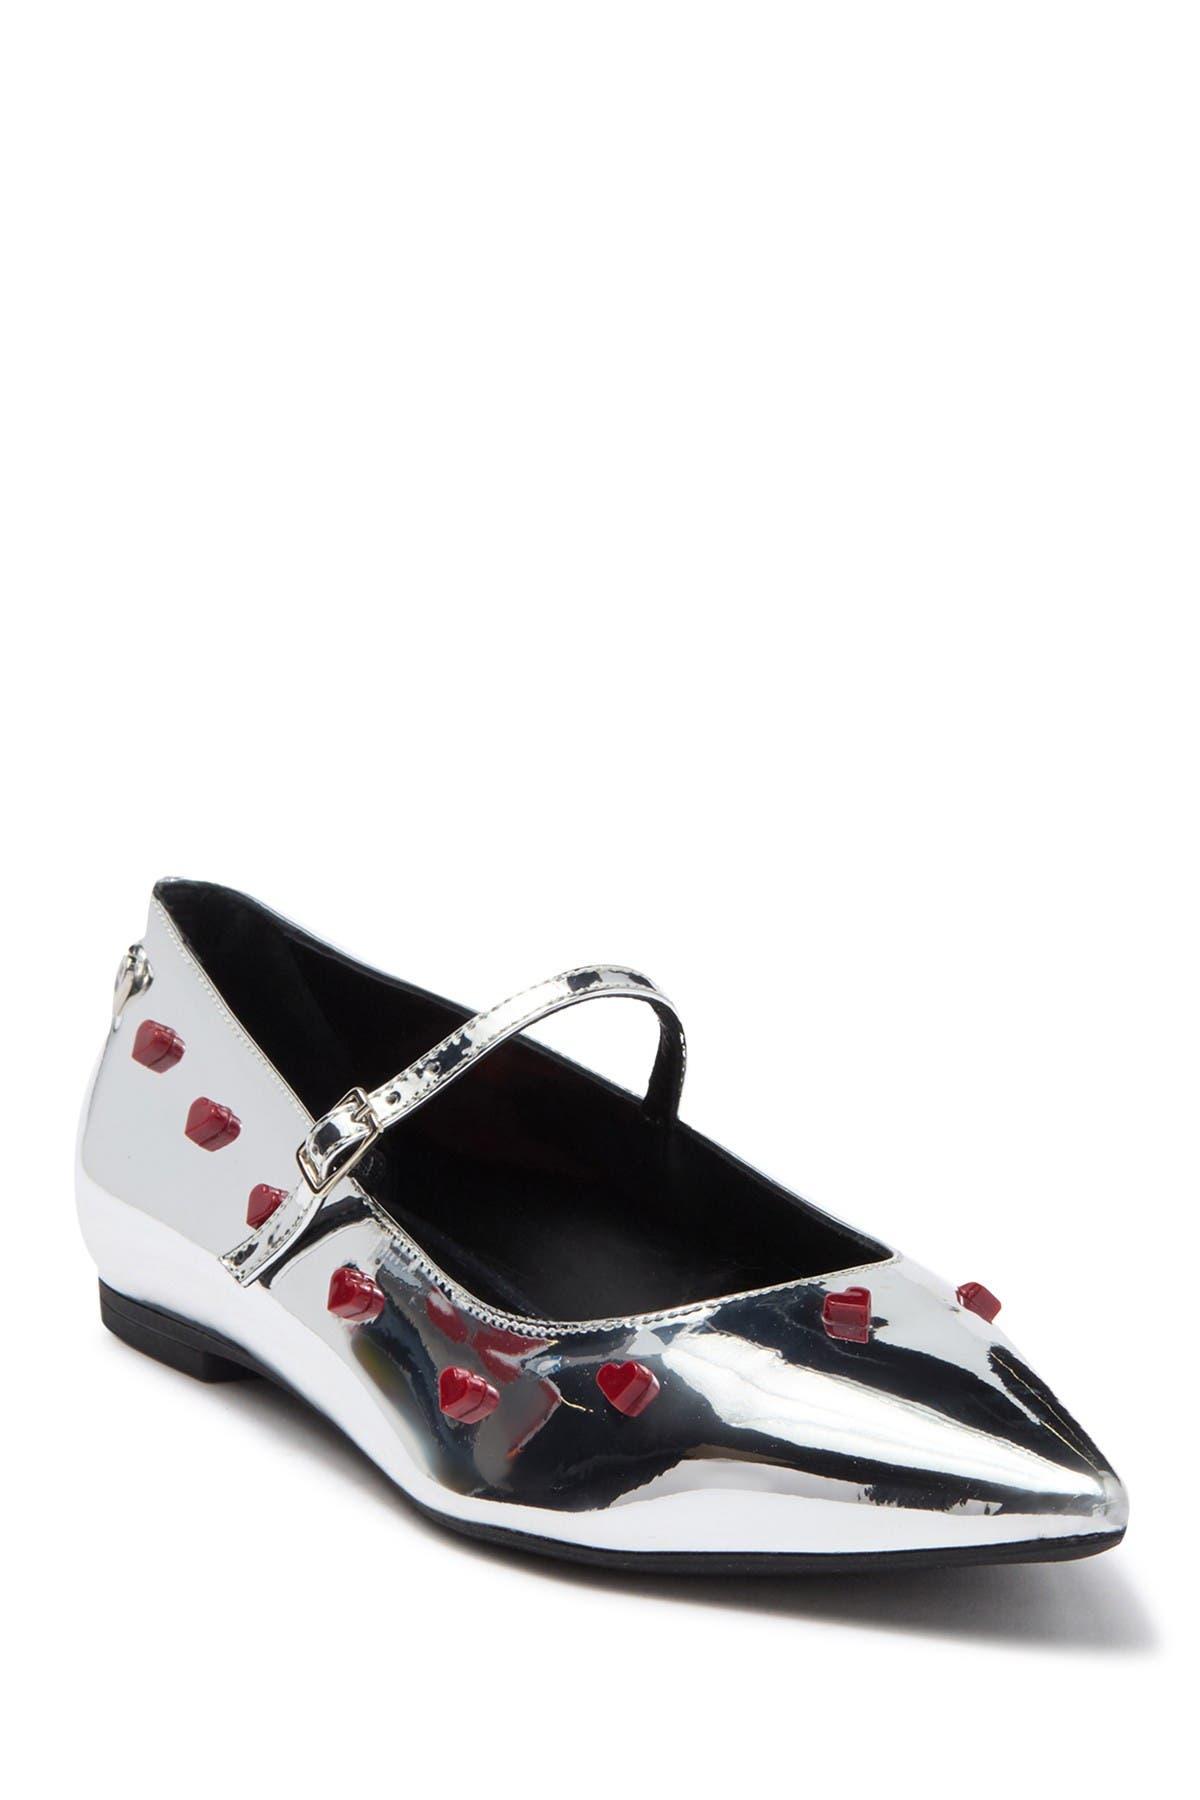 Image of LOVE Moschino Metallic Pointed Toe Flat